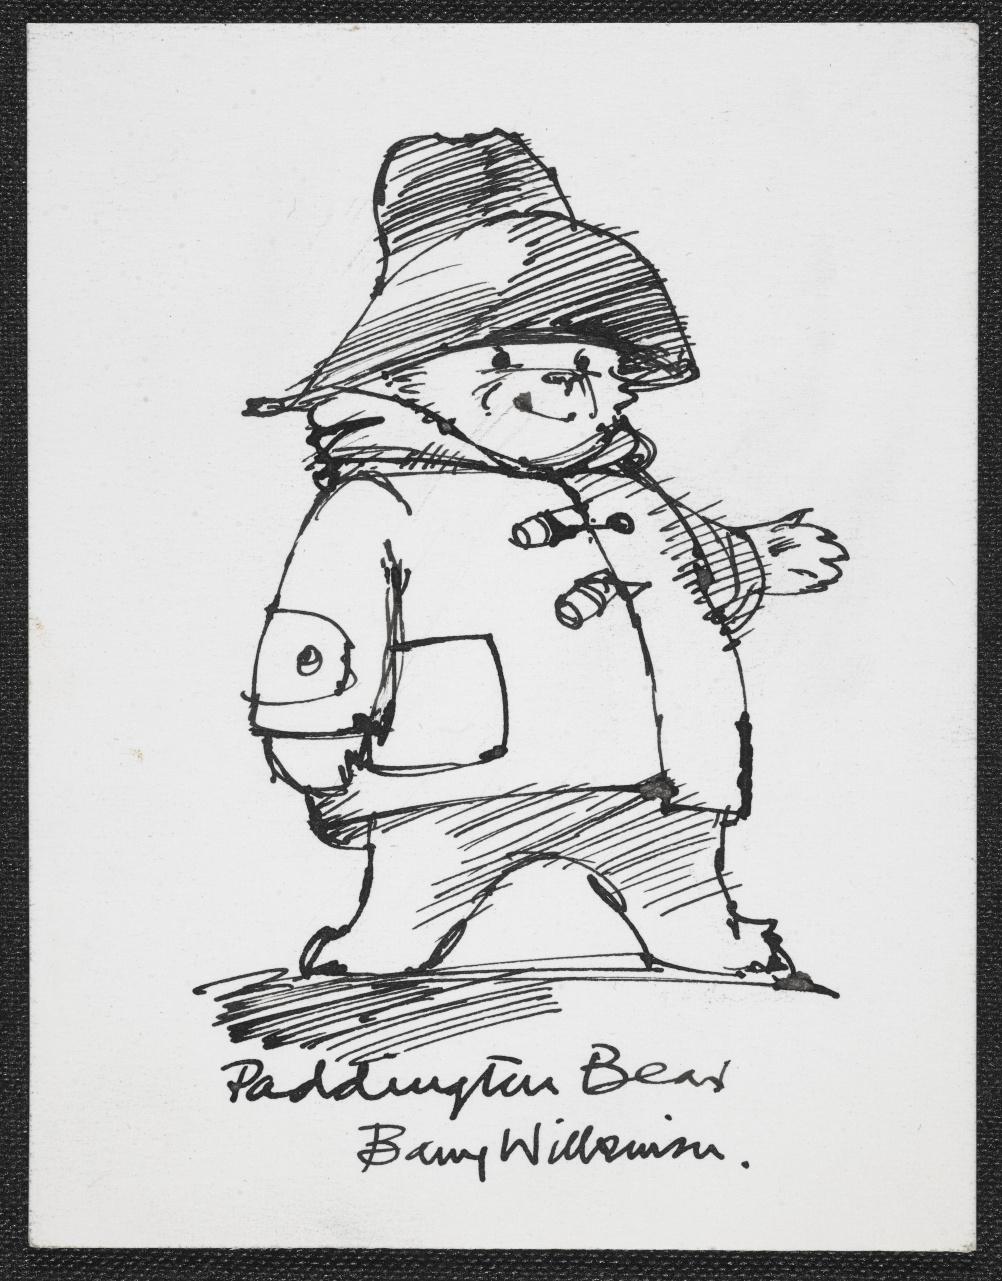 Sketch of Michael Bond's Paddington Bear by Barry Wilkinson